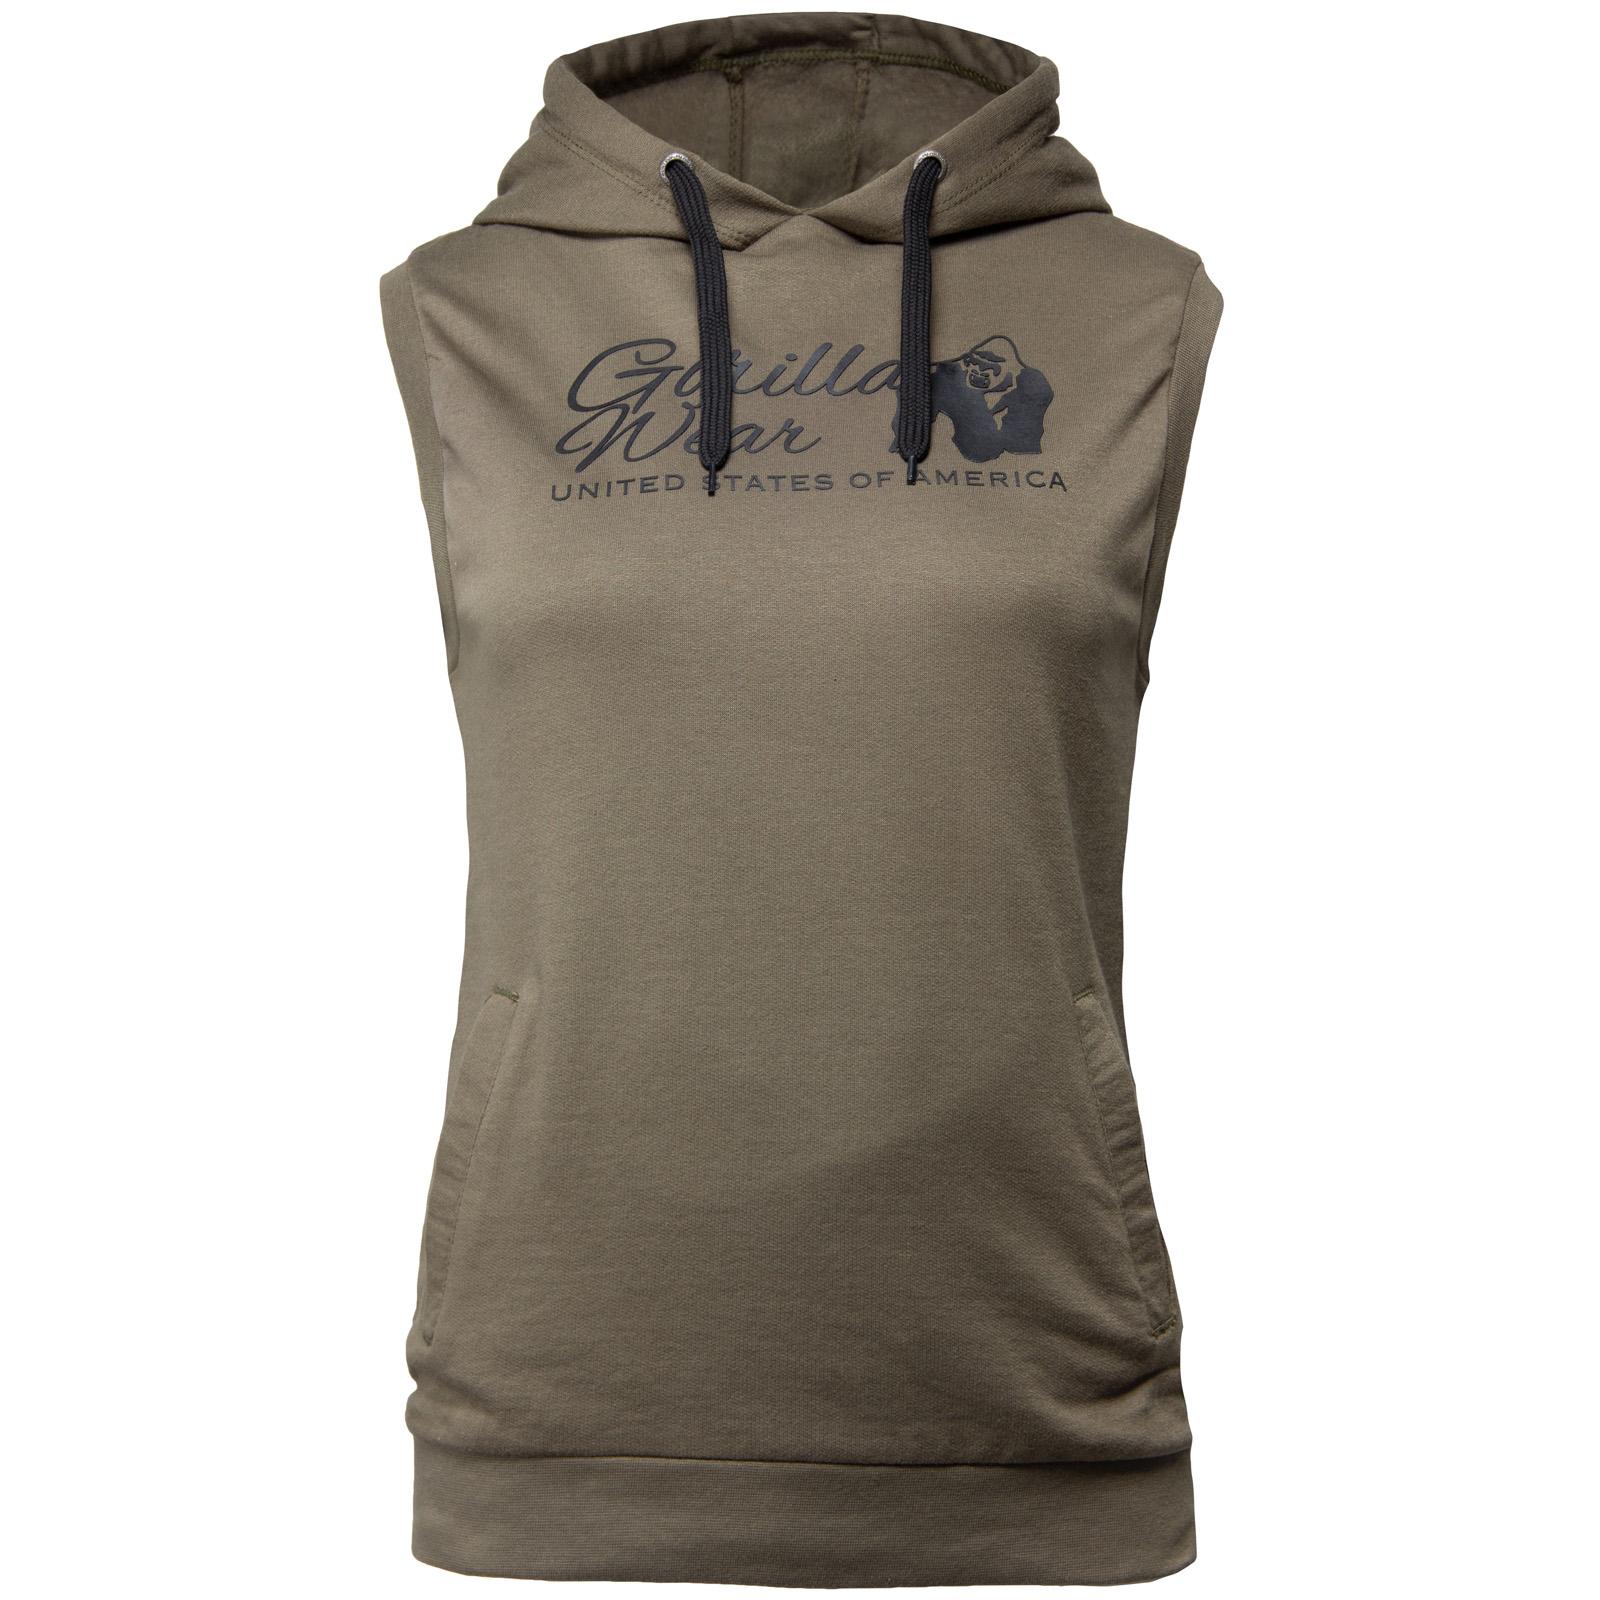 Sport Shirt Dames Hooded Groen - Gorilla Wear Selma kopen? Fitness Singlets|Gorilla Wear|Sportshirts met voordeel vind je hier